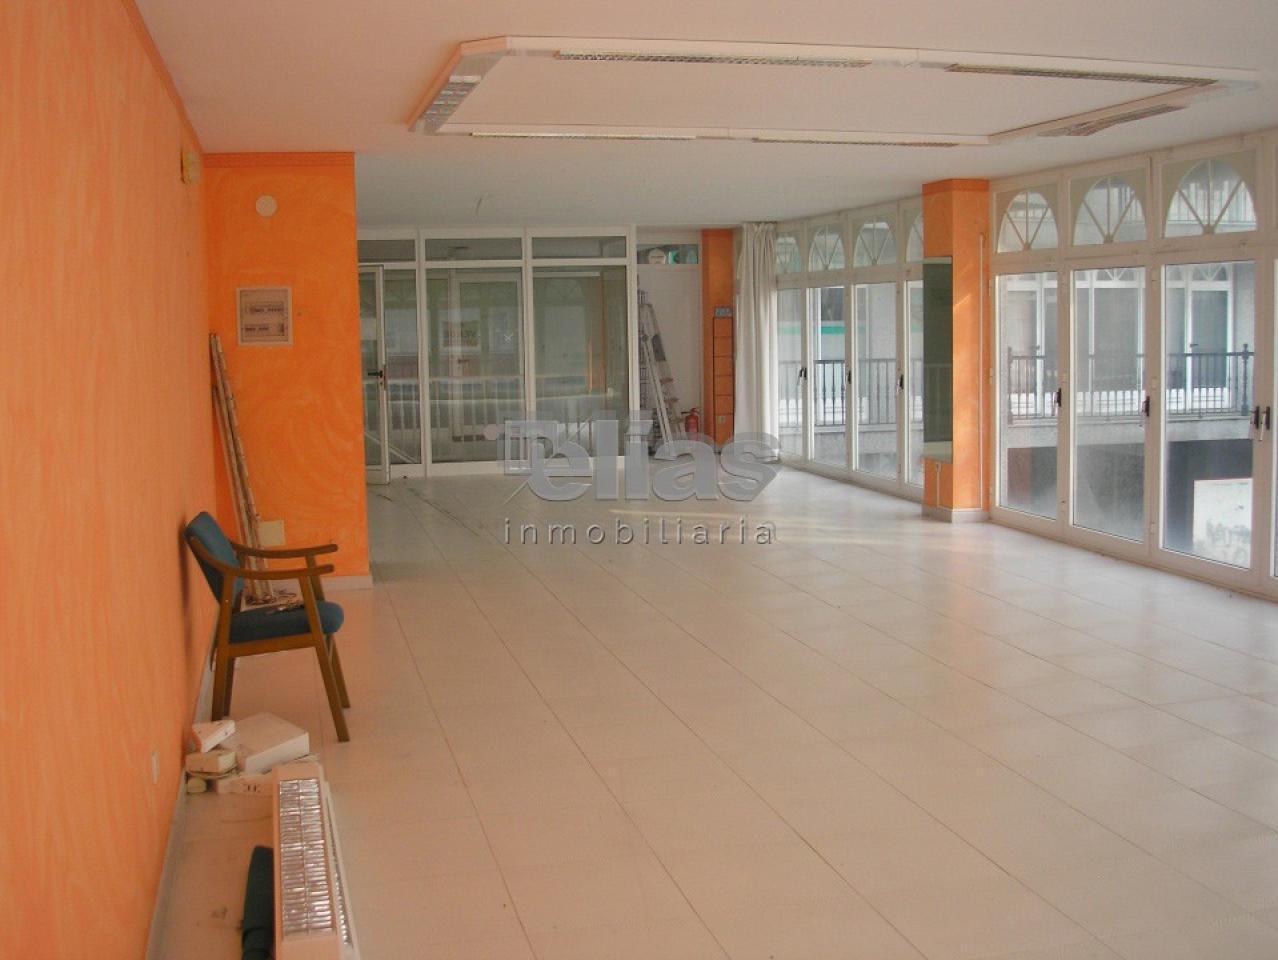 Local en alquiler en Baio – L000513